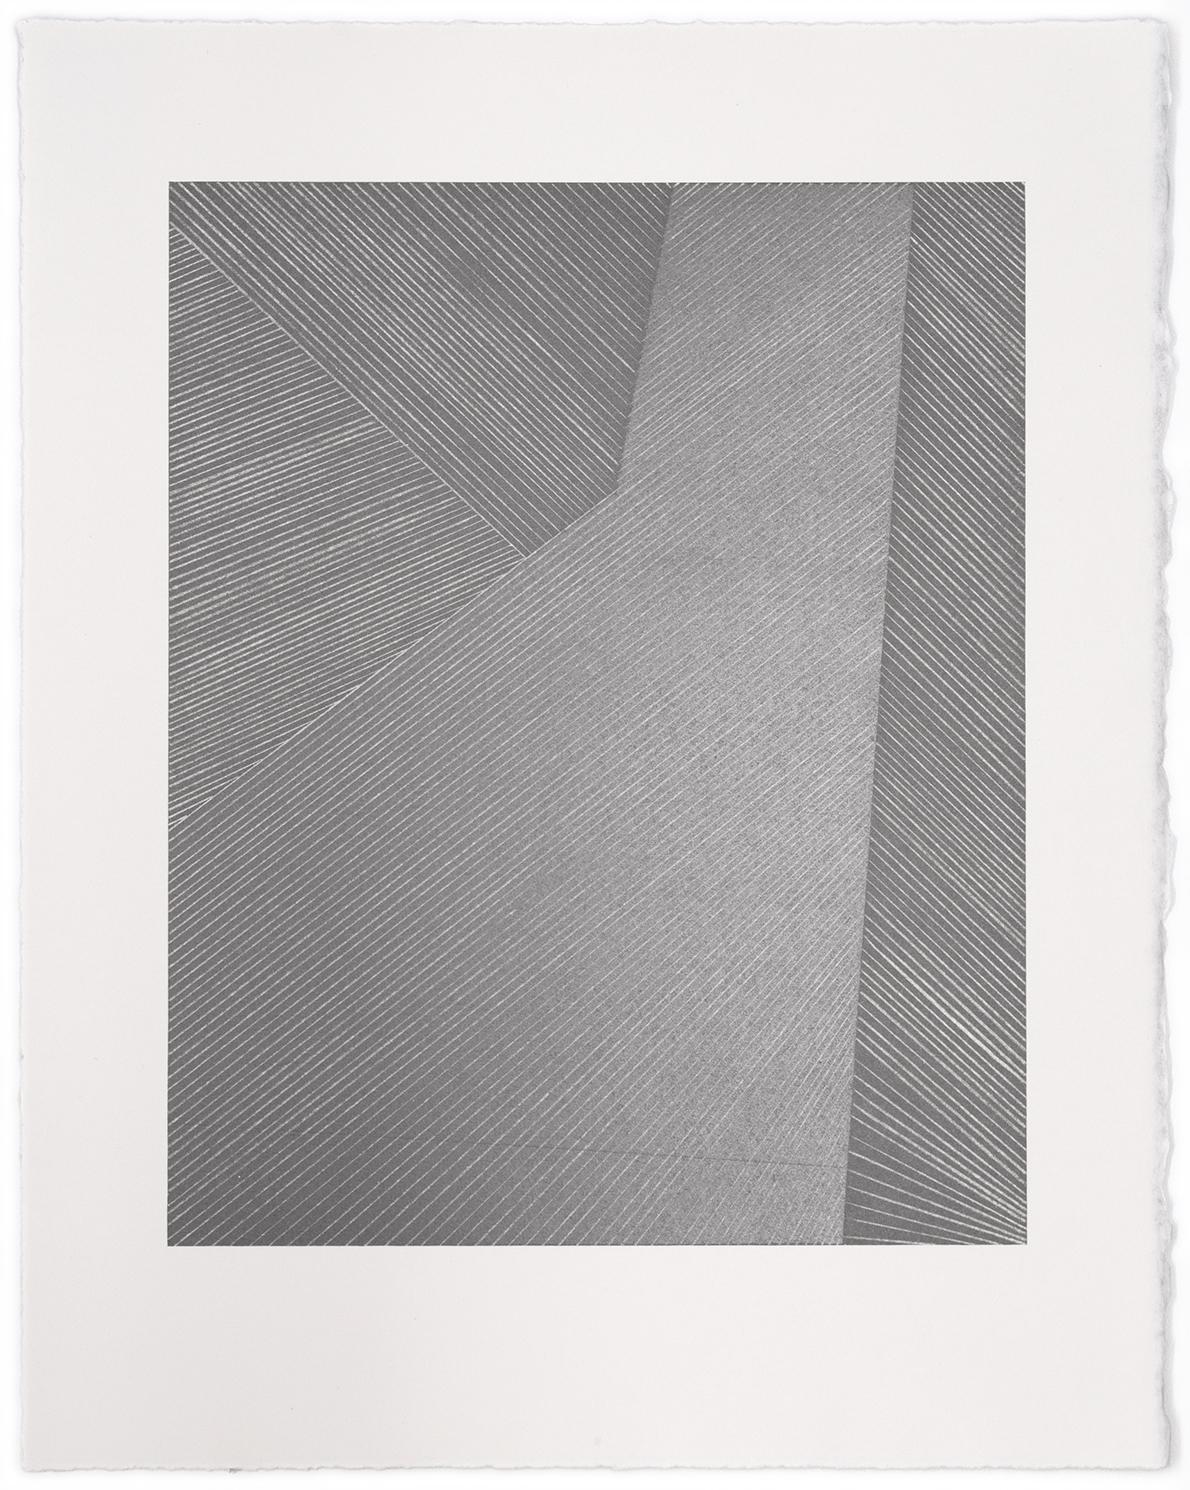 BENJAMIN+Untitled+(Planar+Study).jpg